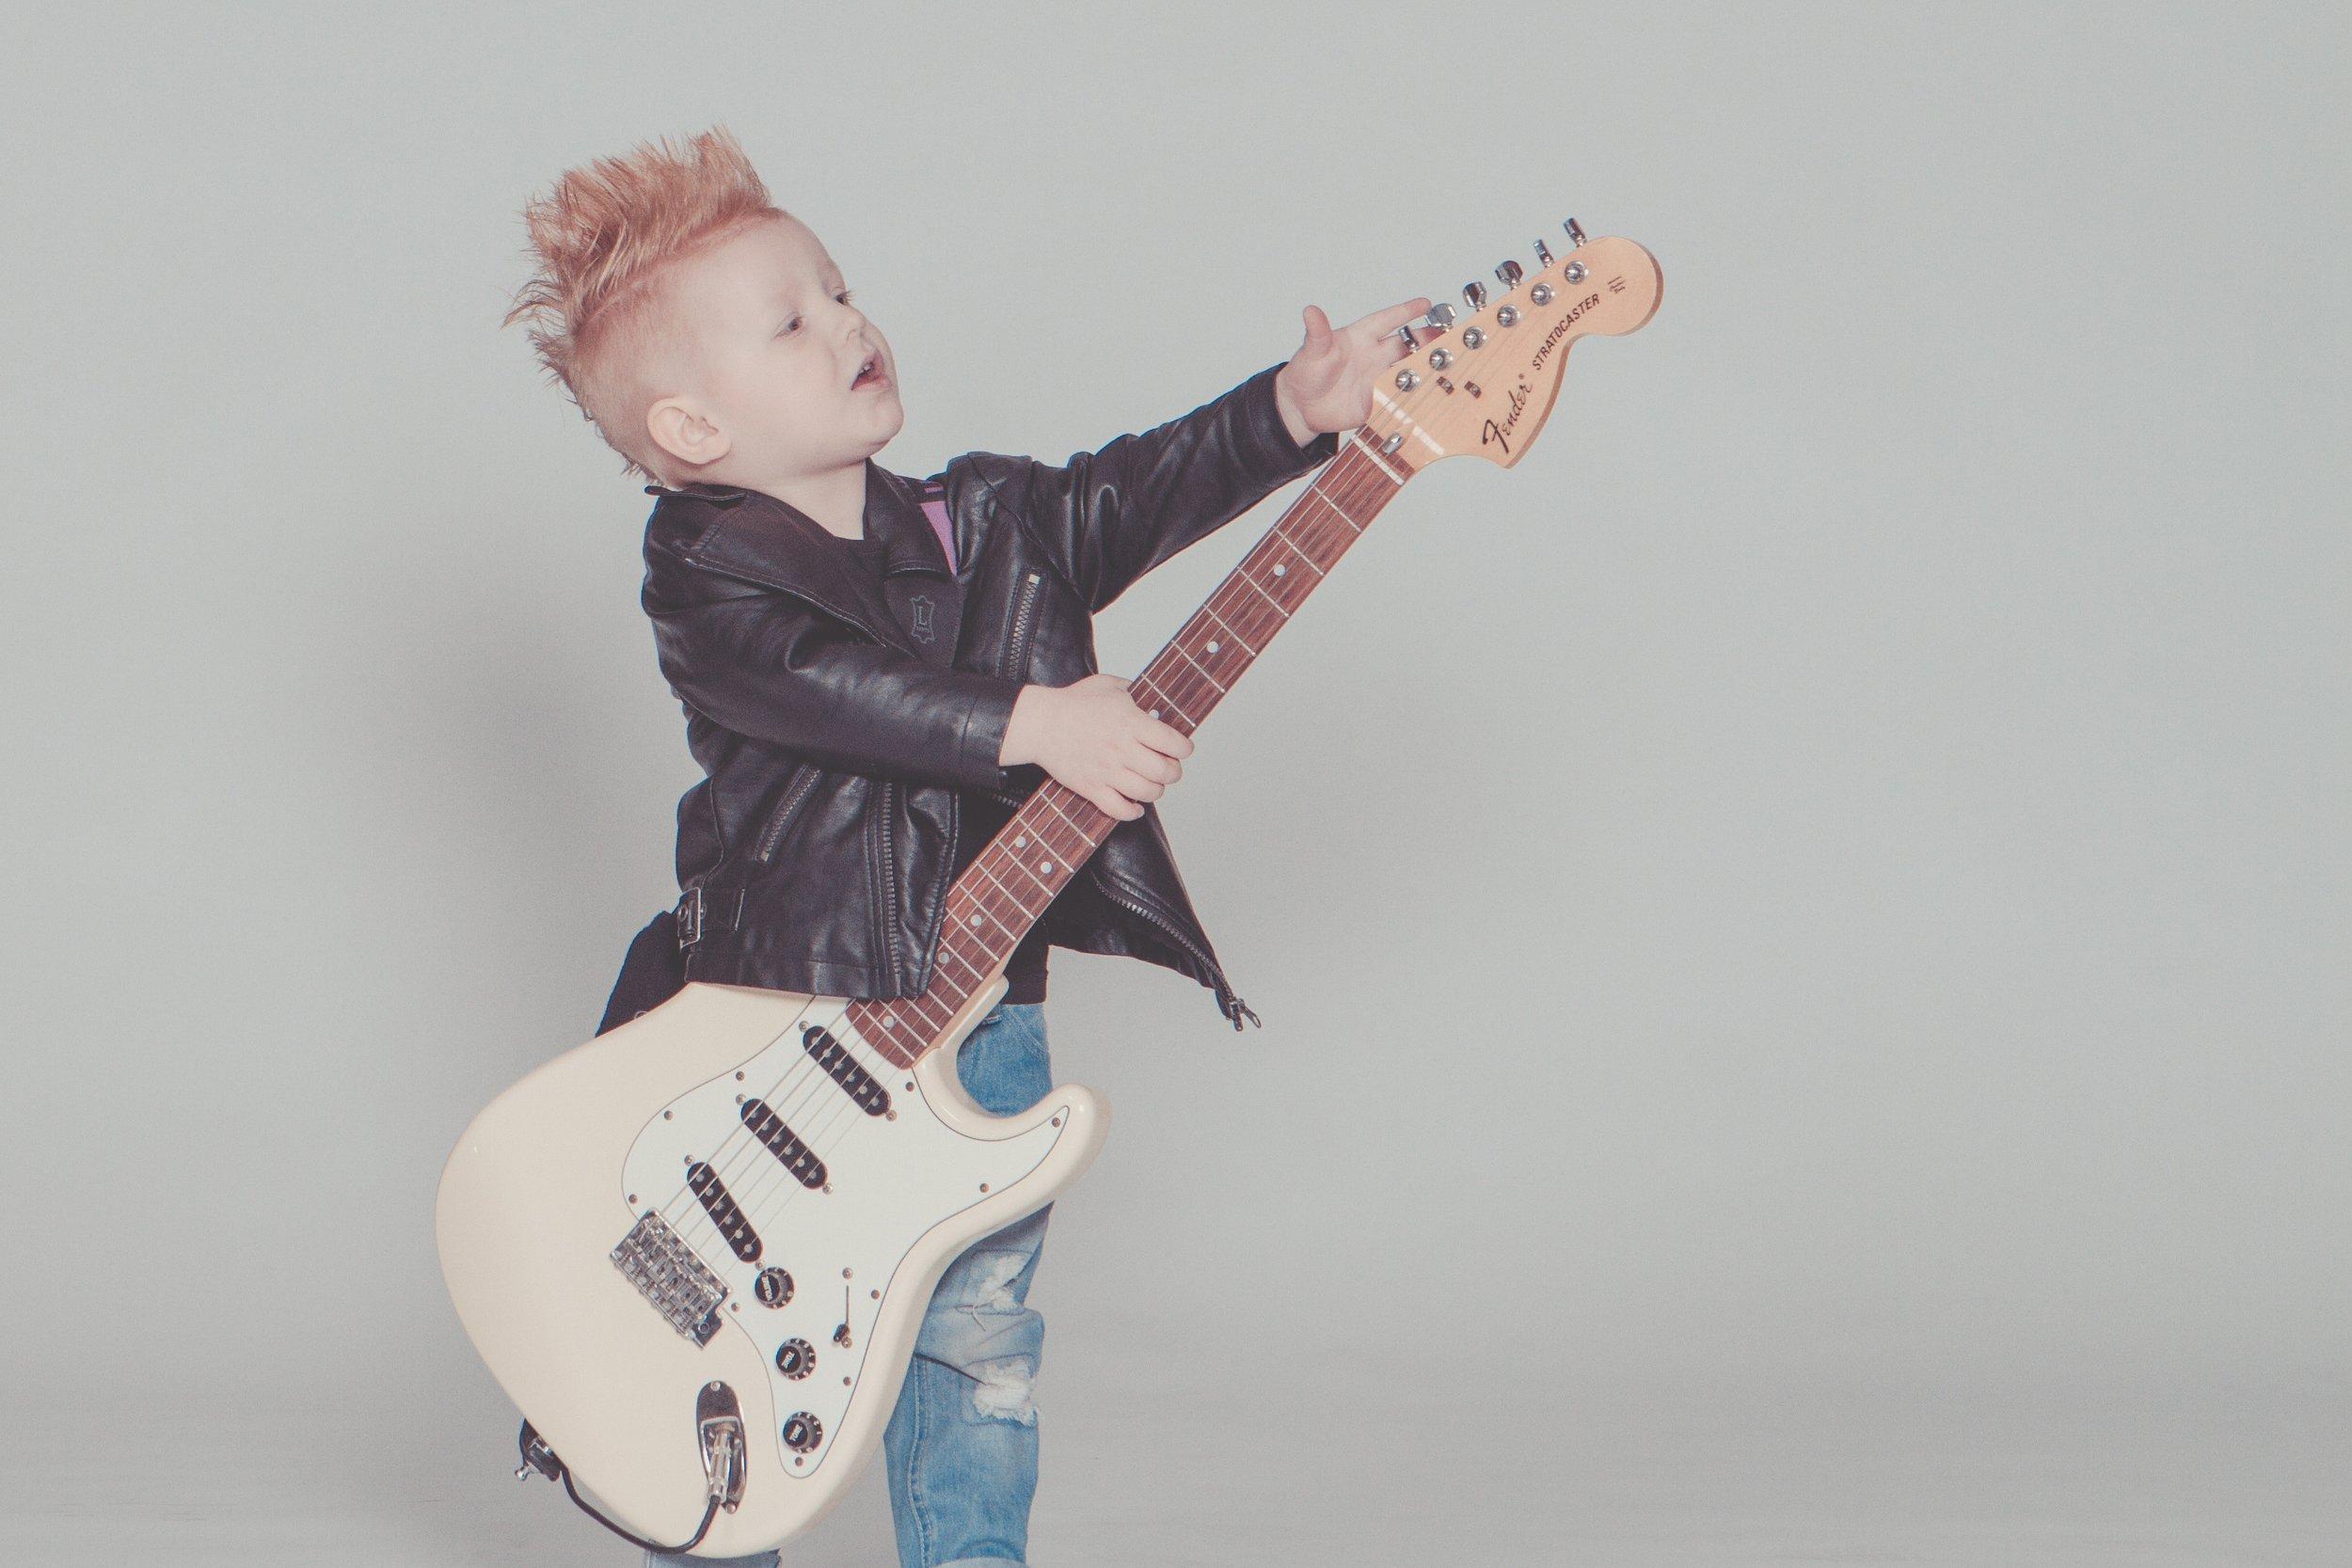 blue-jeans-boy-child-164835.jpg